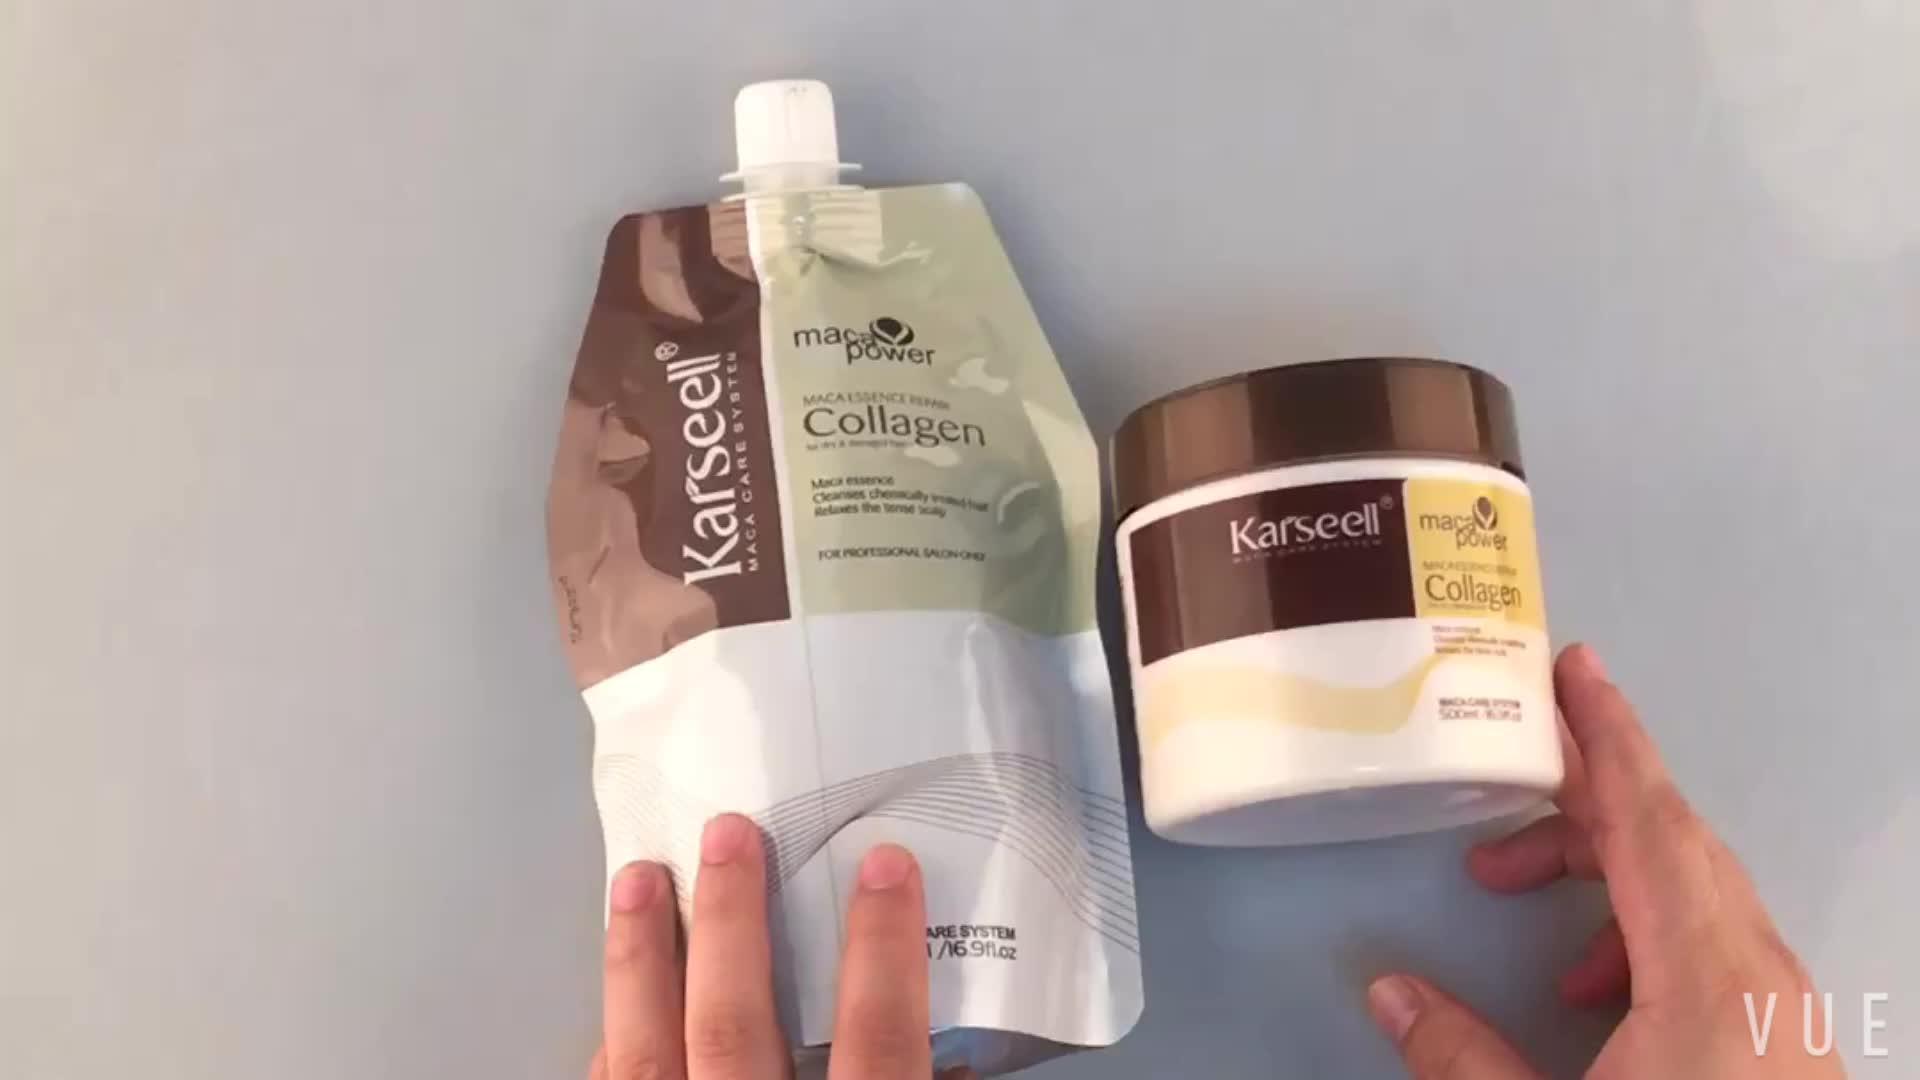 Karseell arganolie collageen haarmasker bio eiwit keratine haar behandeling crème